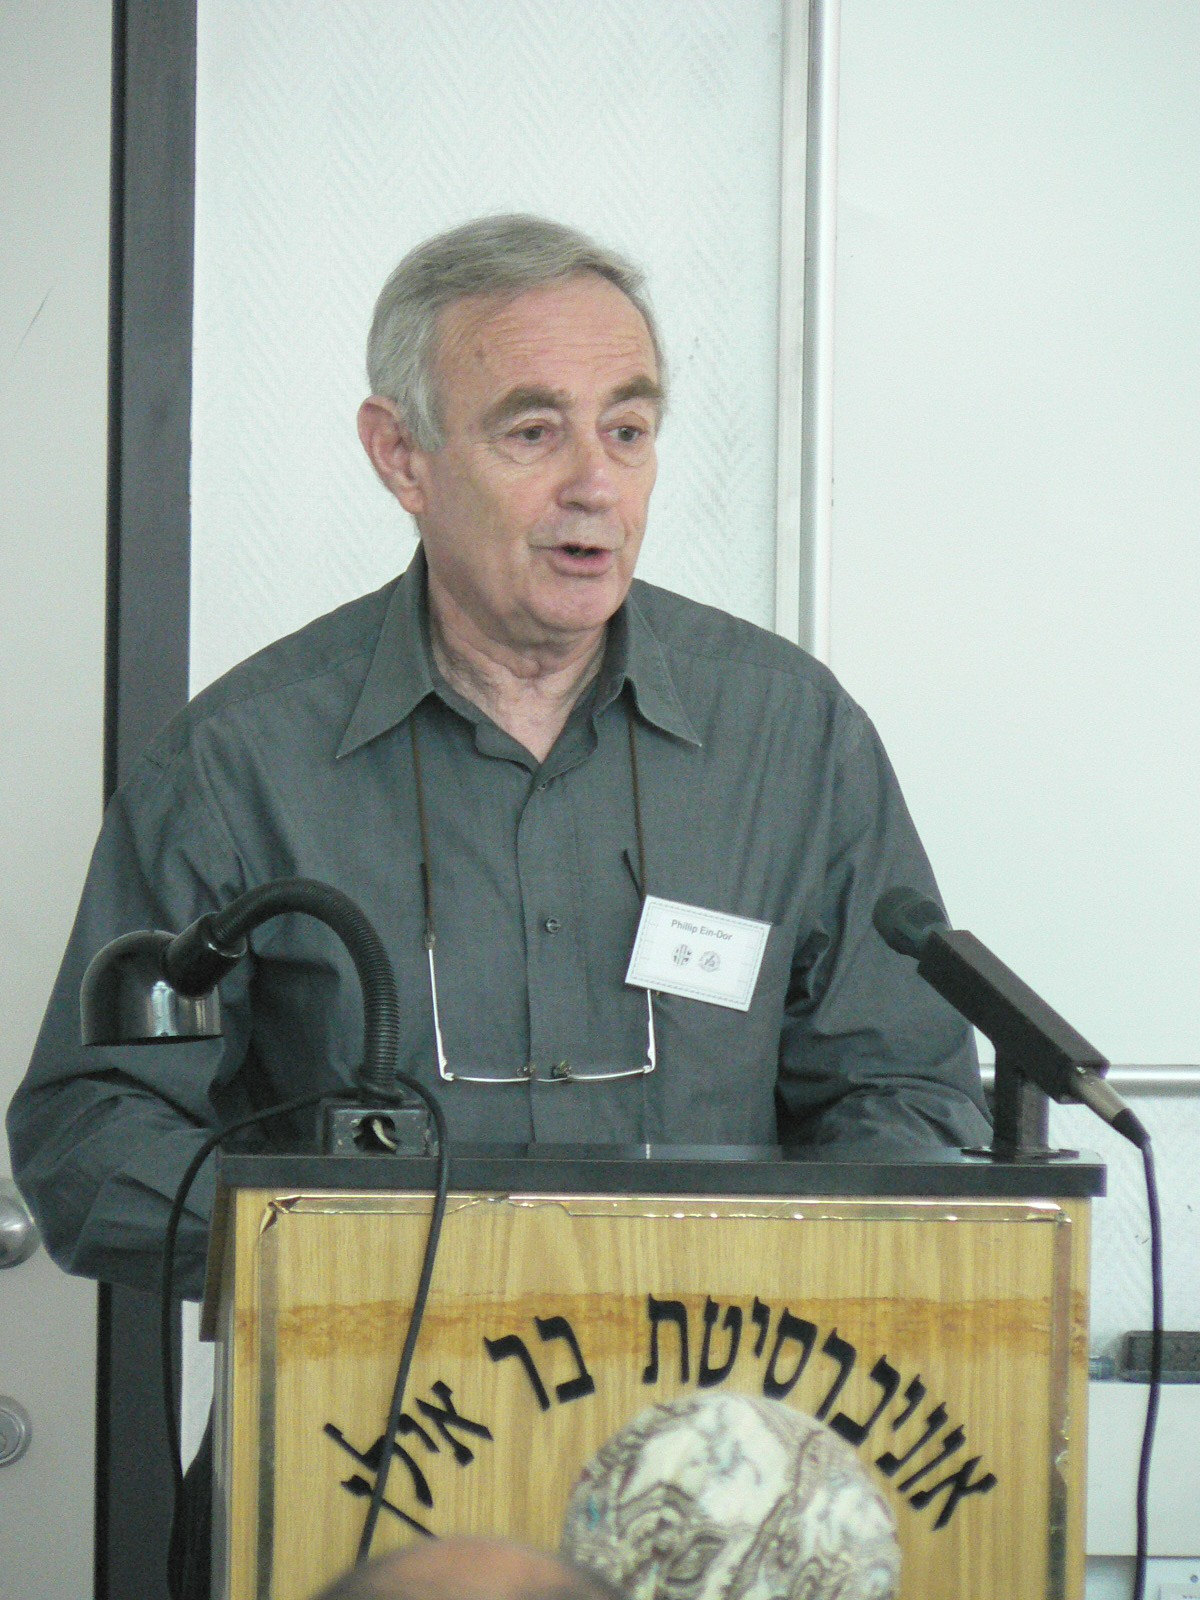 Phillip Ein-Dor - ILAIS2007